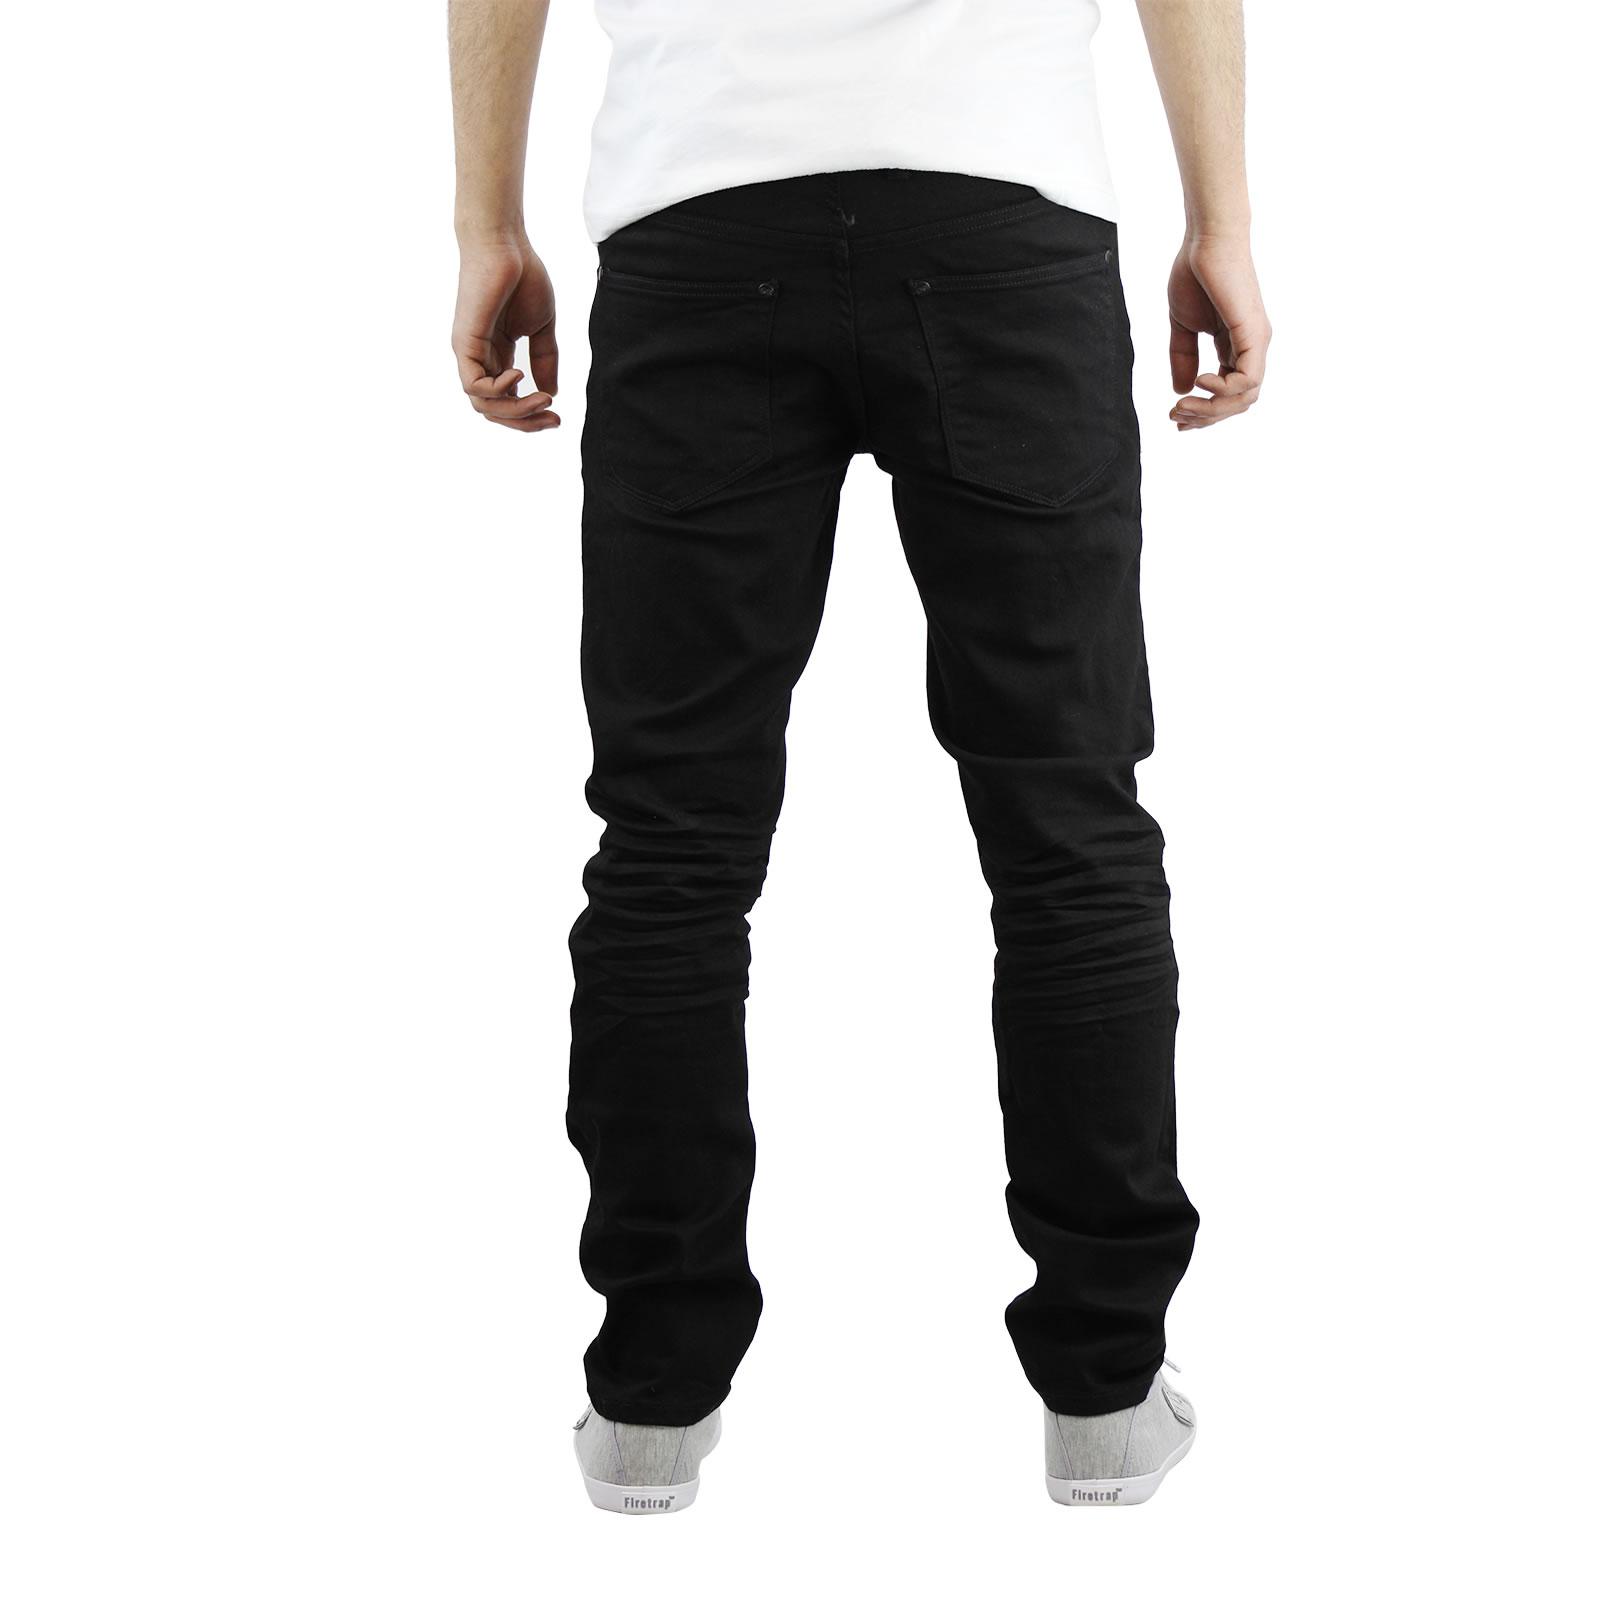 miniature 4 - Homme-Crosshatch-Jaco-Slim-Jeans-stretch-pantalon-denim-effet-vieilli